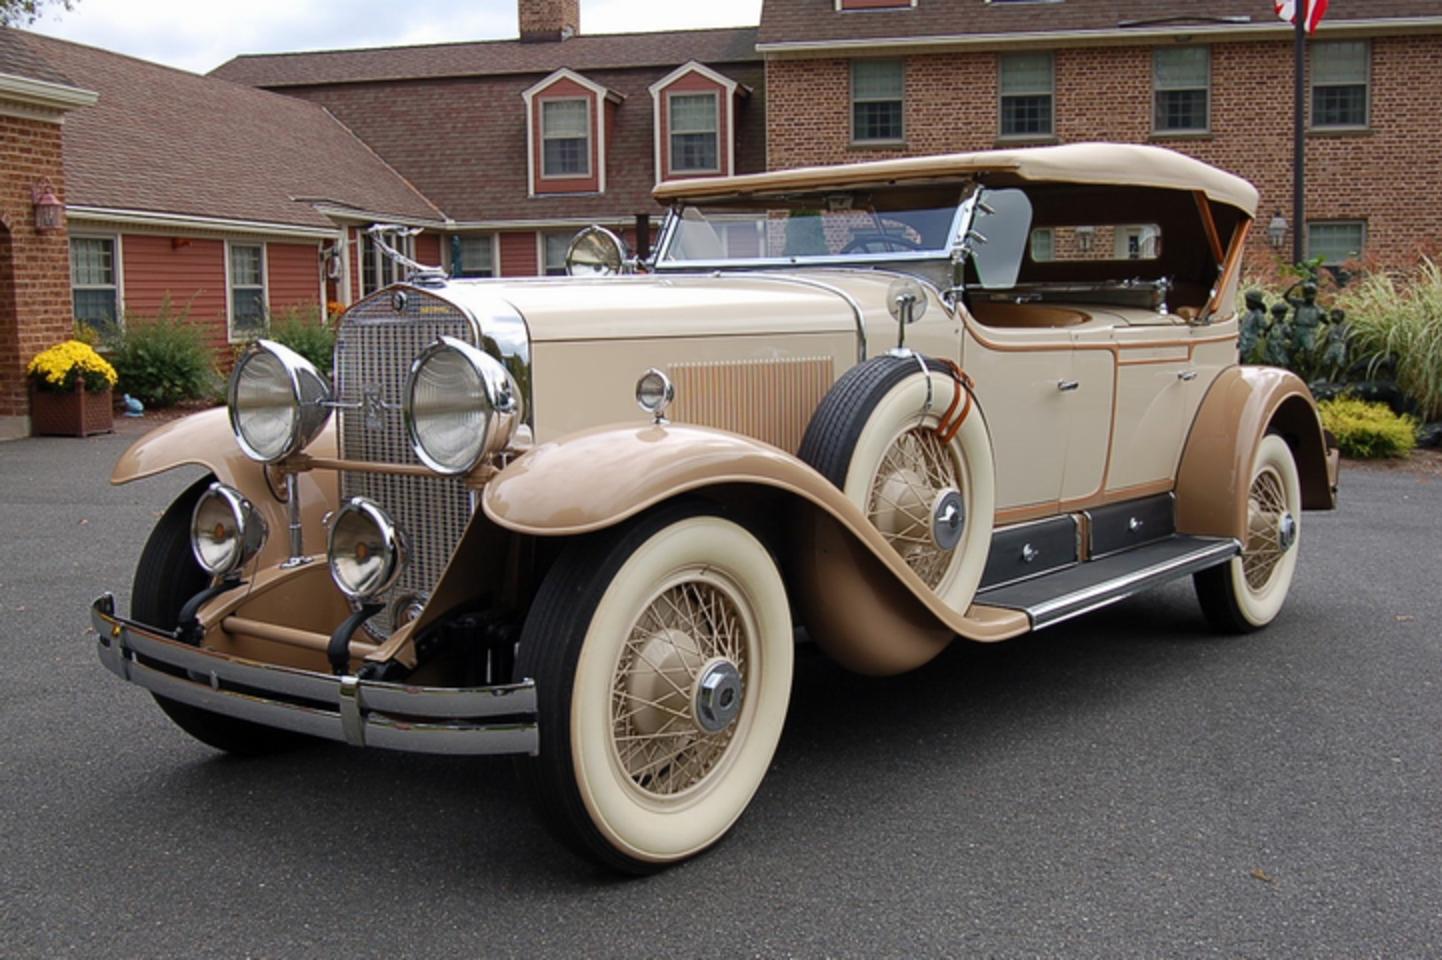 Cadillac: Prestige Cars, SUVs, Sedans, Coupes & Crossovers Cadillac through the years photos